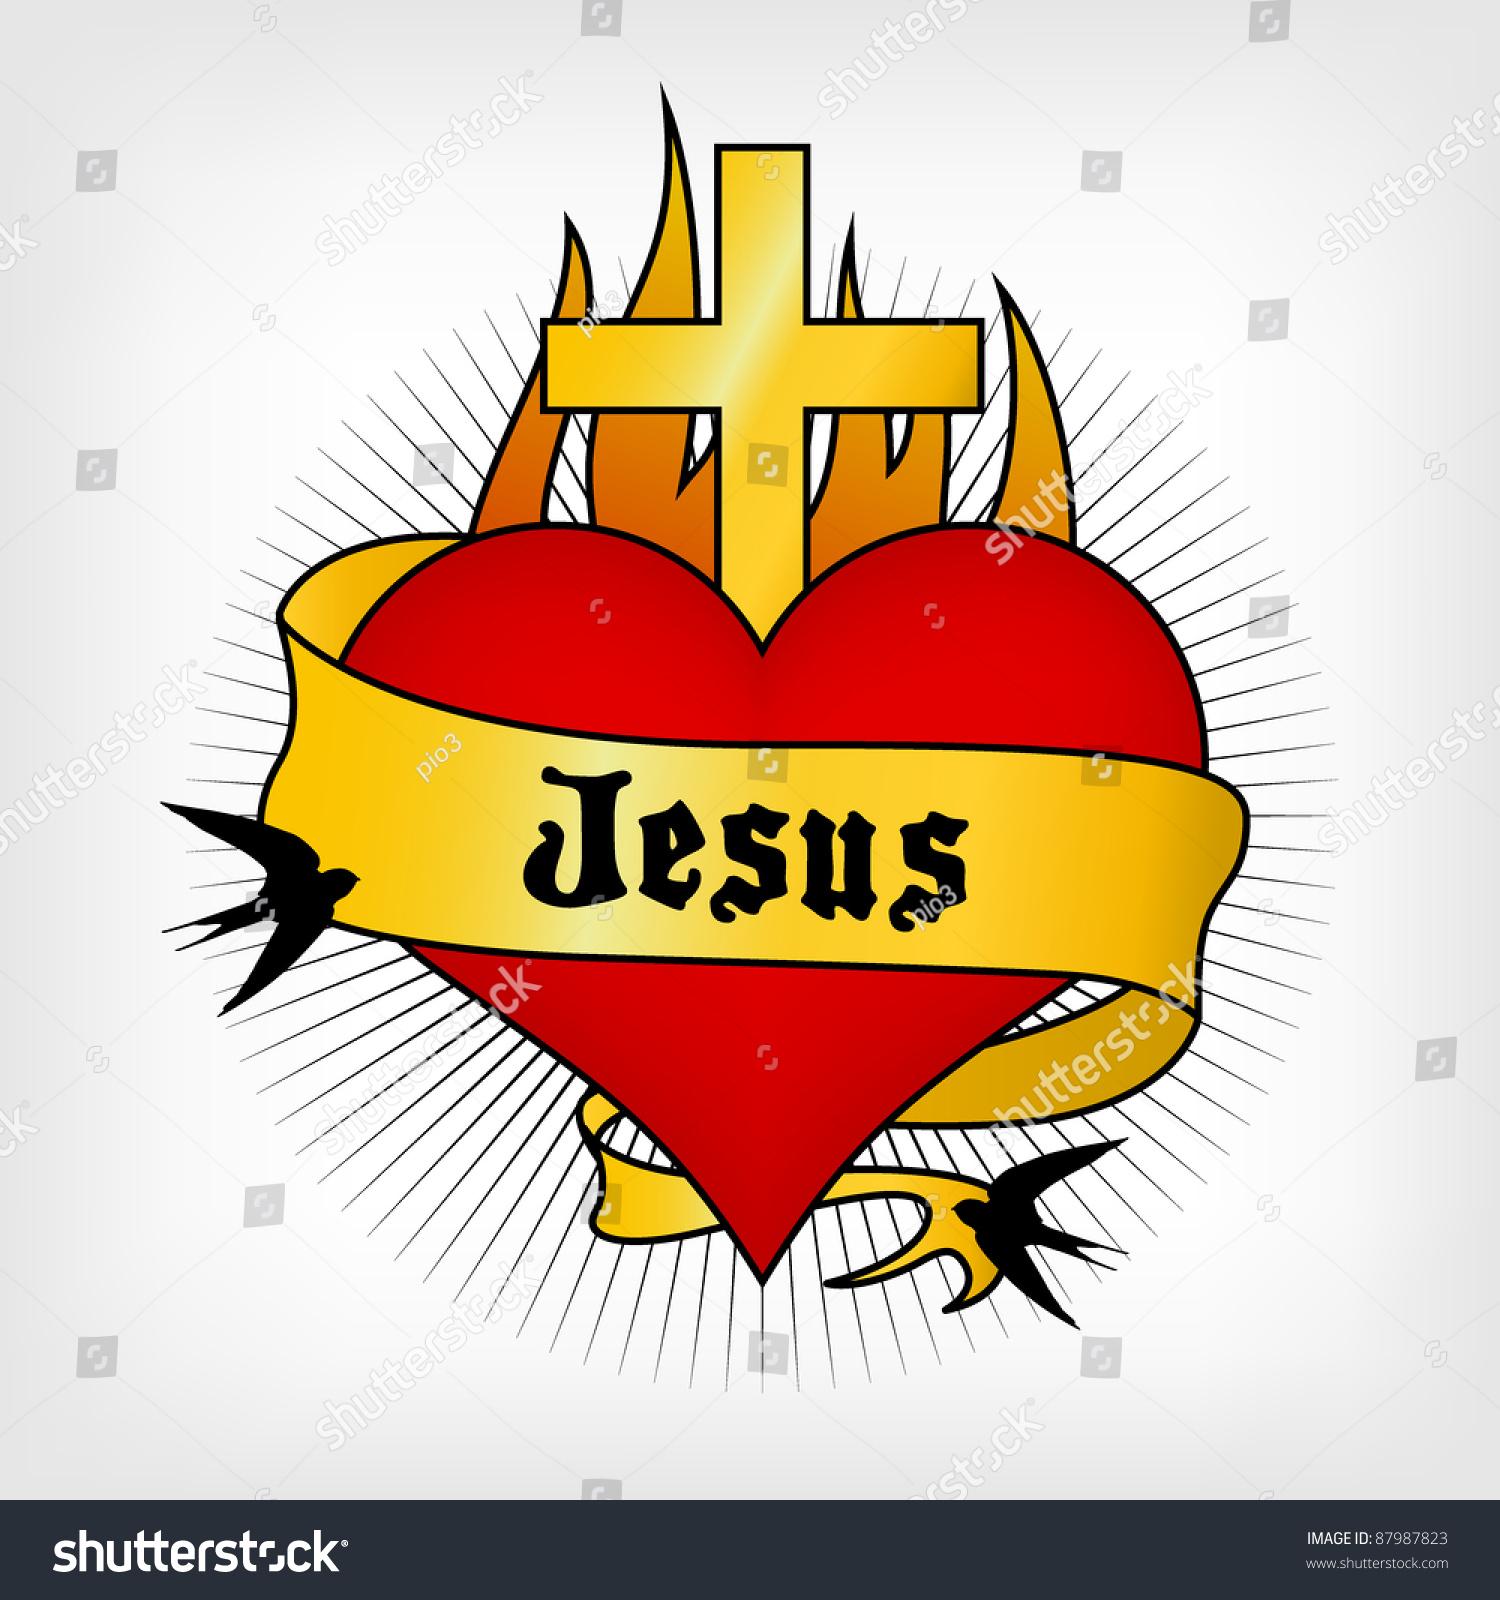 Heart Tattoo Sword Jesus Written On Stock-Vektorgrafik 87987823 ...